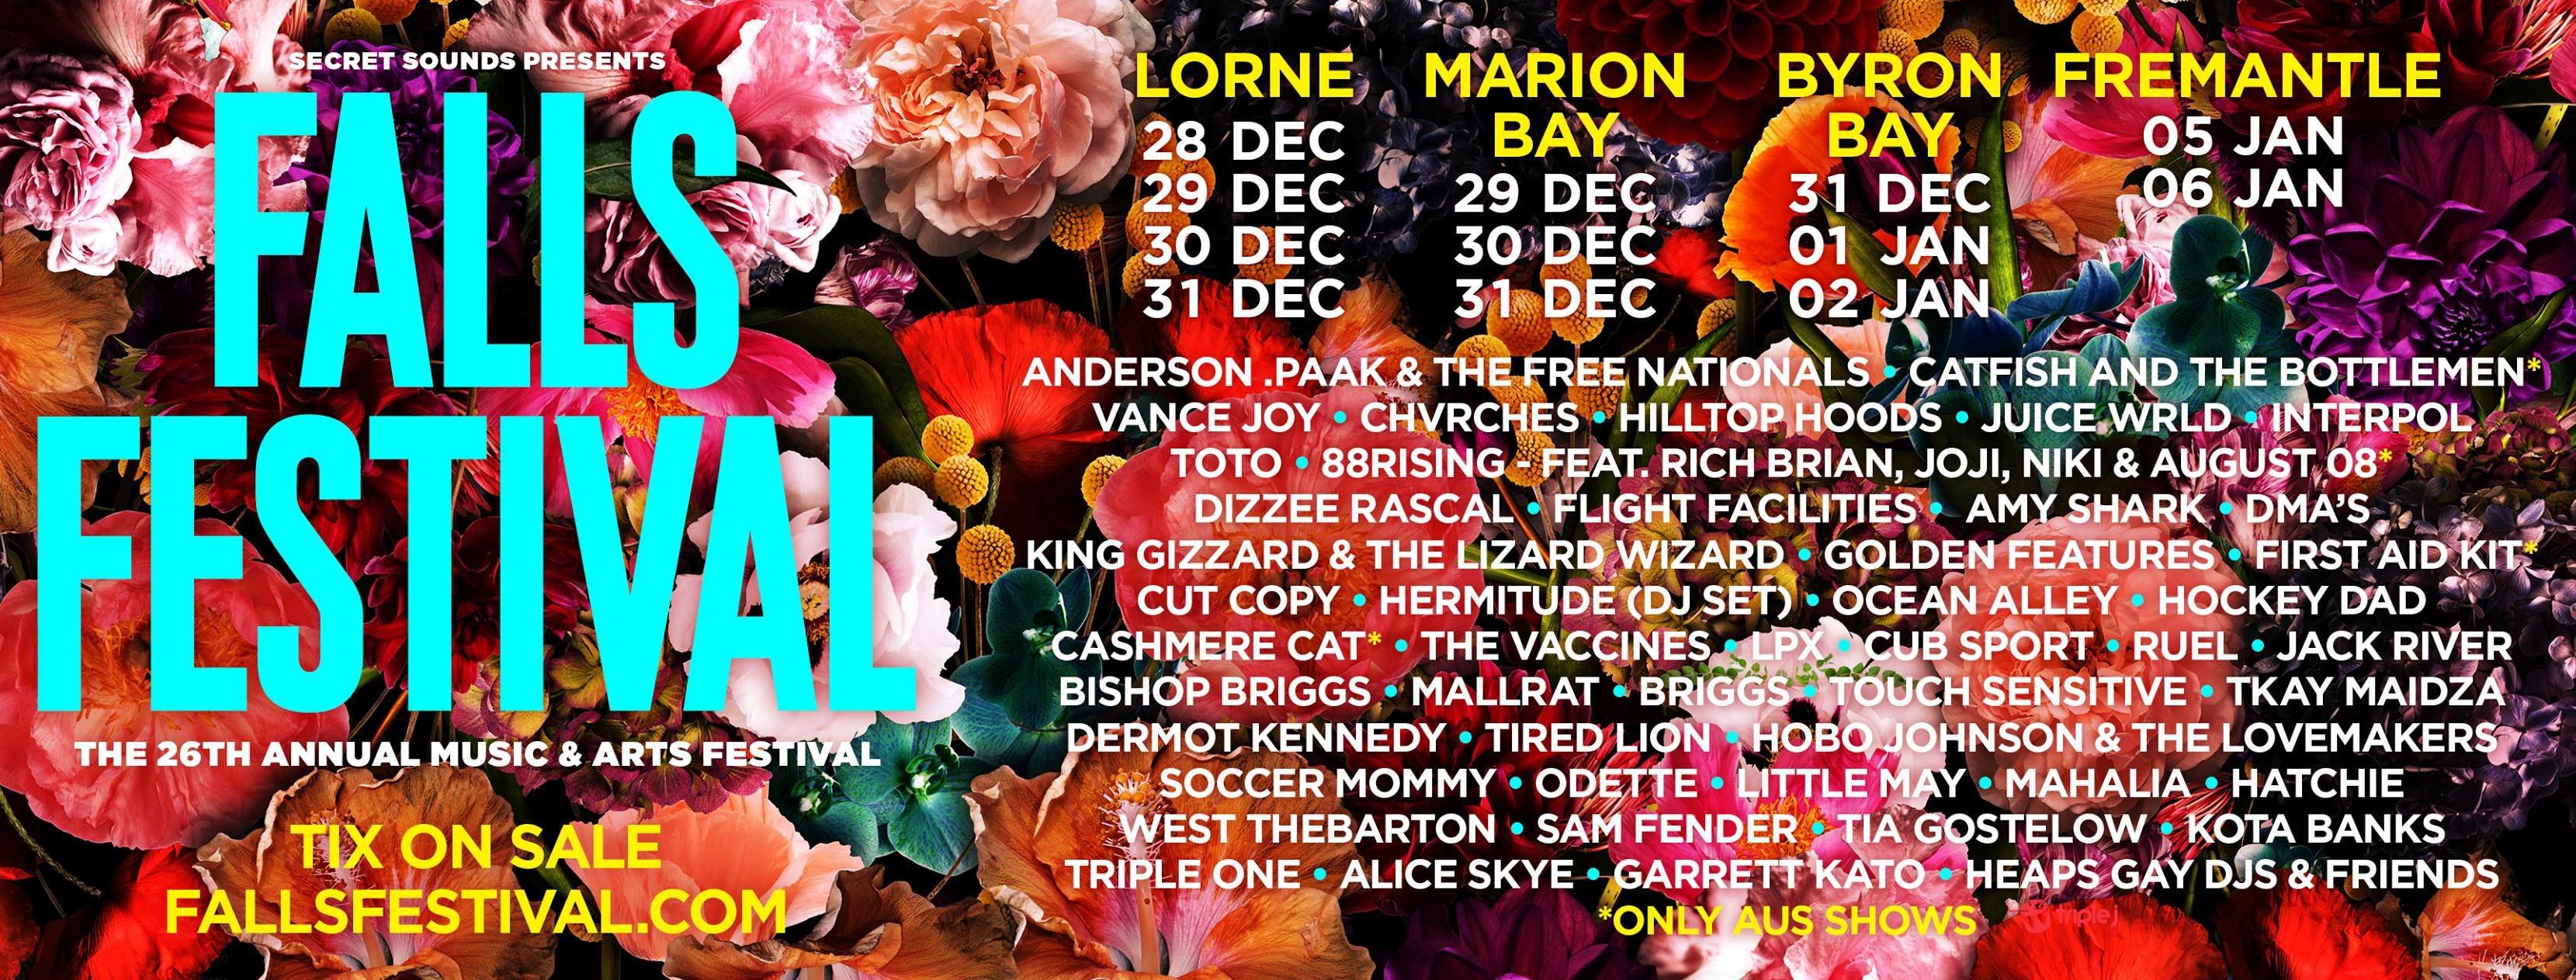 March 2019 Calendar Sri Lanka Más Arriba-a-fecha 30 Music Festivals In Australia to Experience before You Die Of March 2019 Calendar Sri Lanka Más Arriba-a-fecha Sri Lanka Permanent Mission to the United Nations